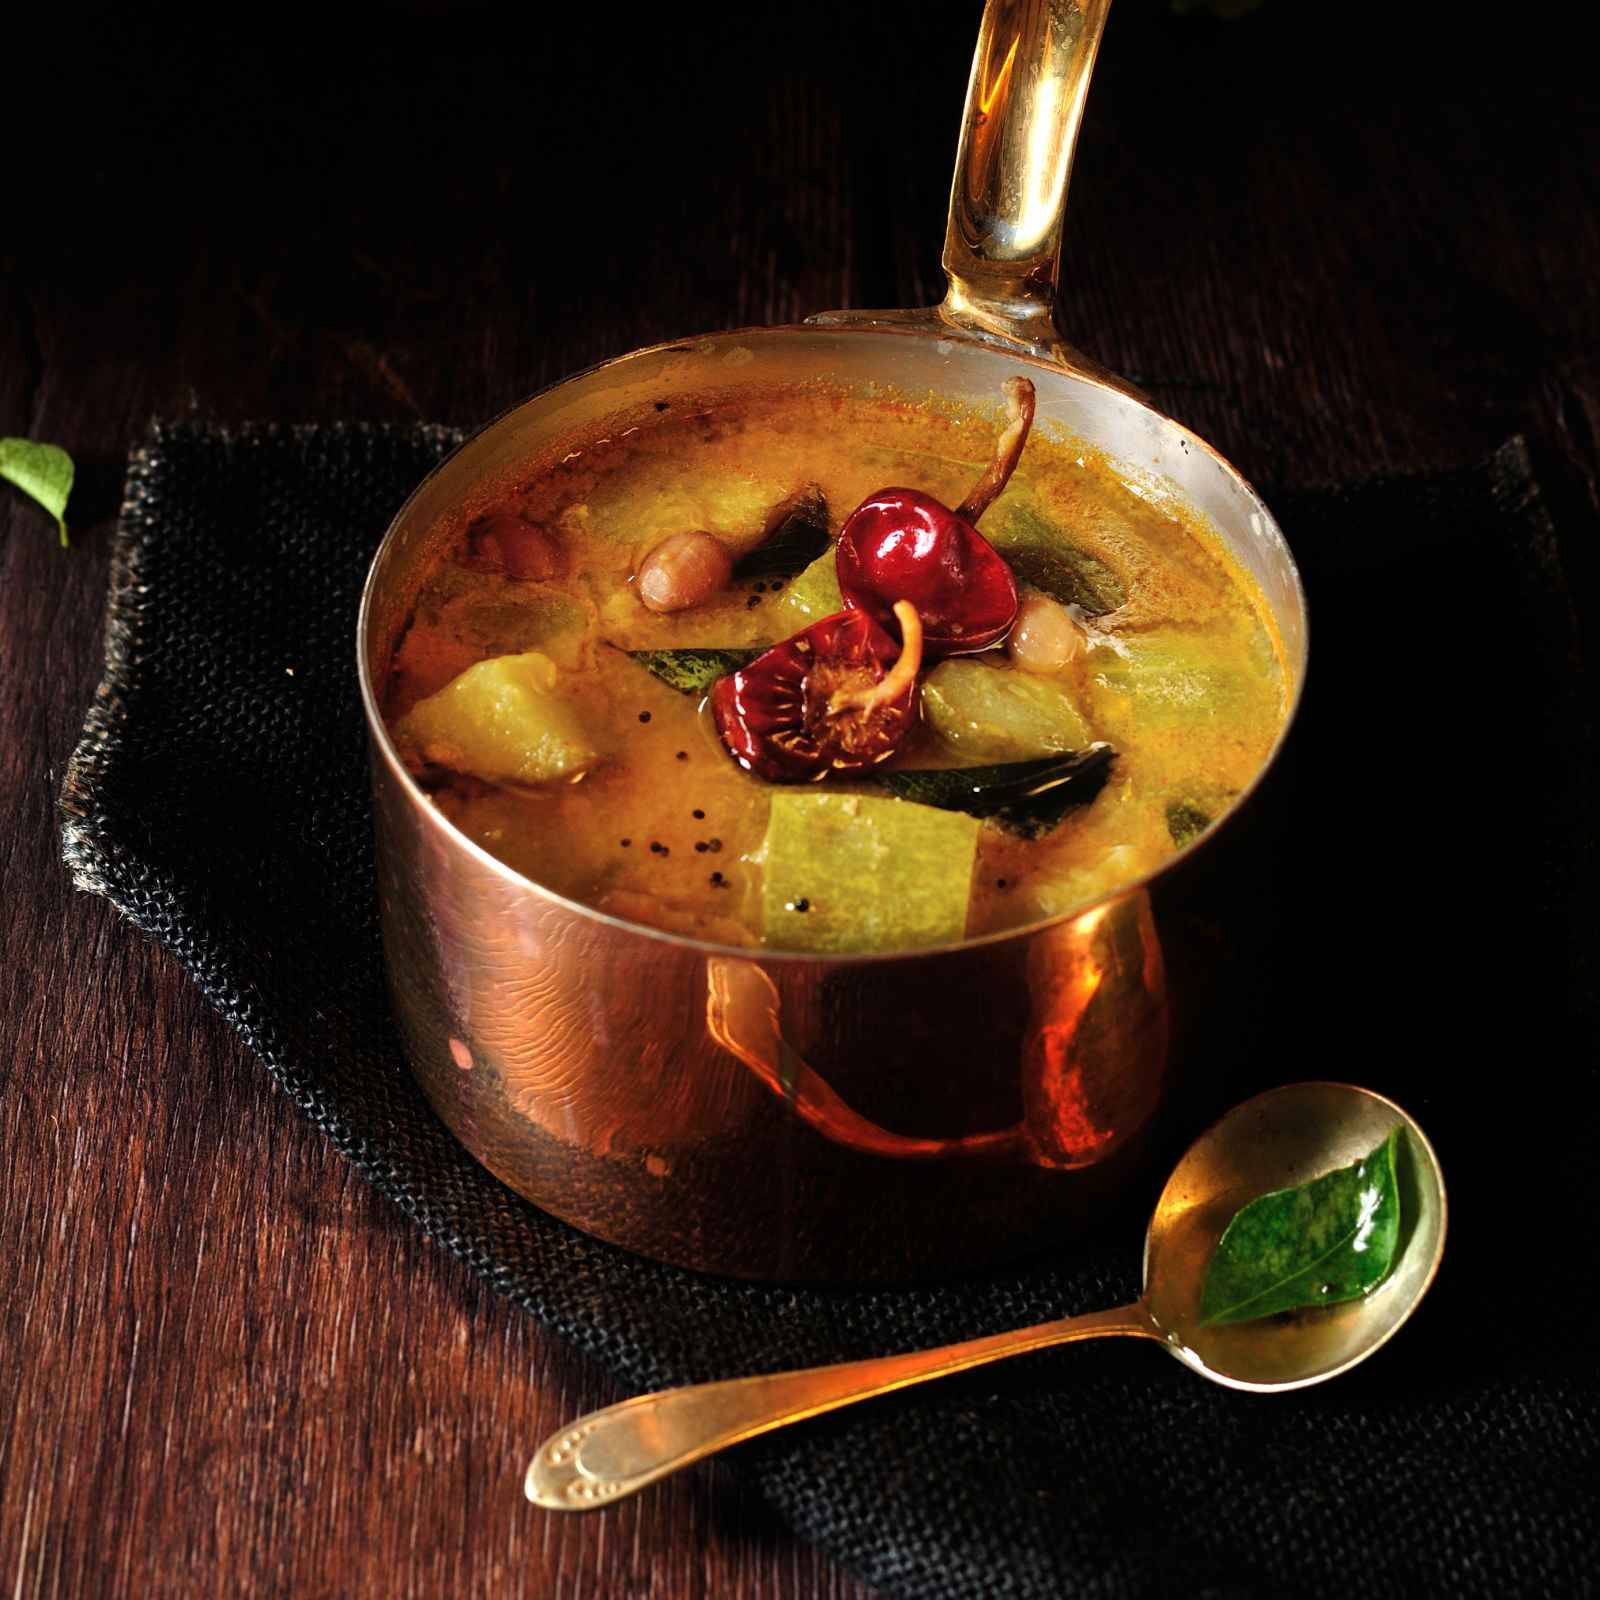 Karnataka special huli tovve recipe kannada cuisine pinterest karnataka special huli tovve recipe kannada cuisine pinterest indian curry karnataka and curry forumfinder Images